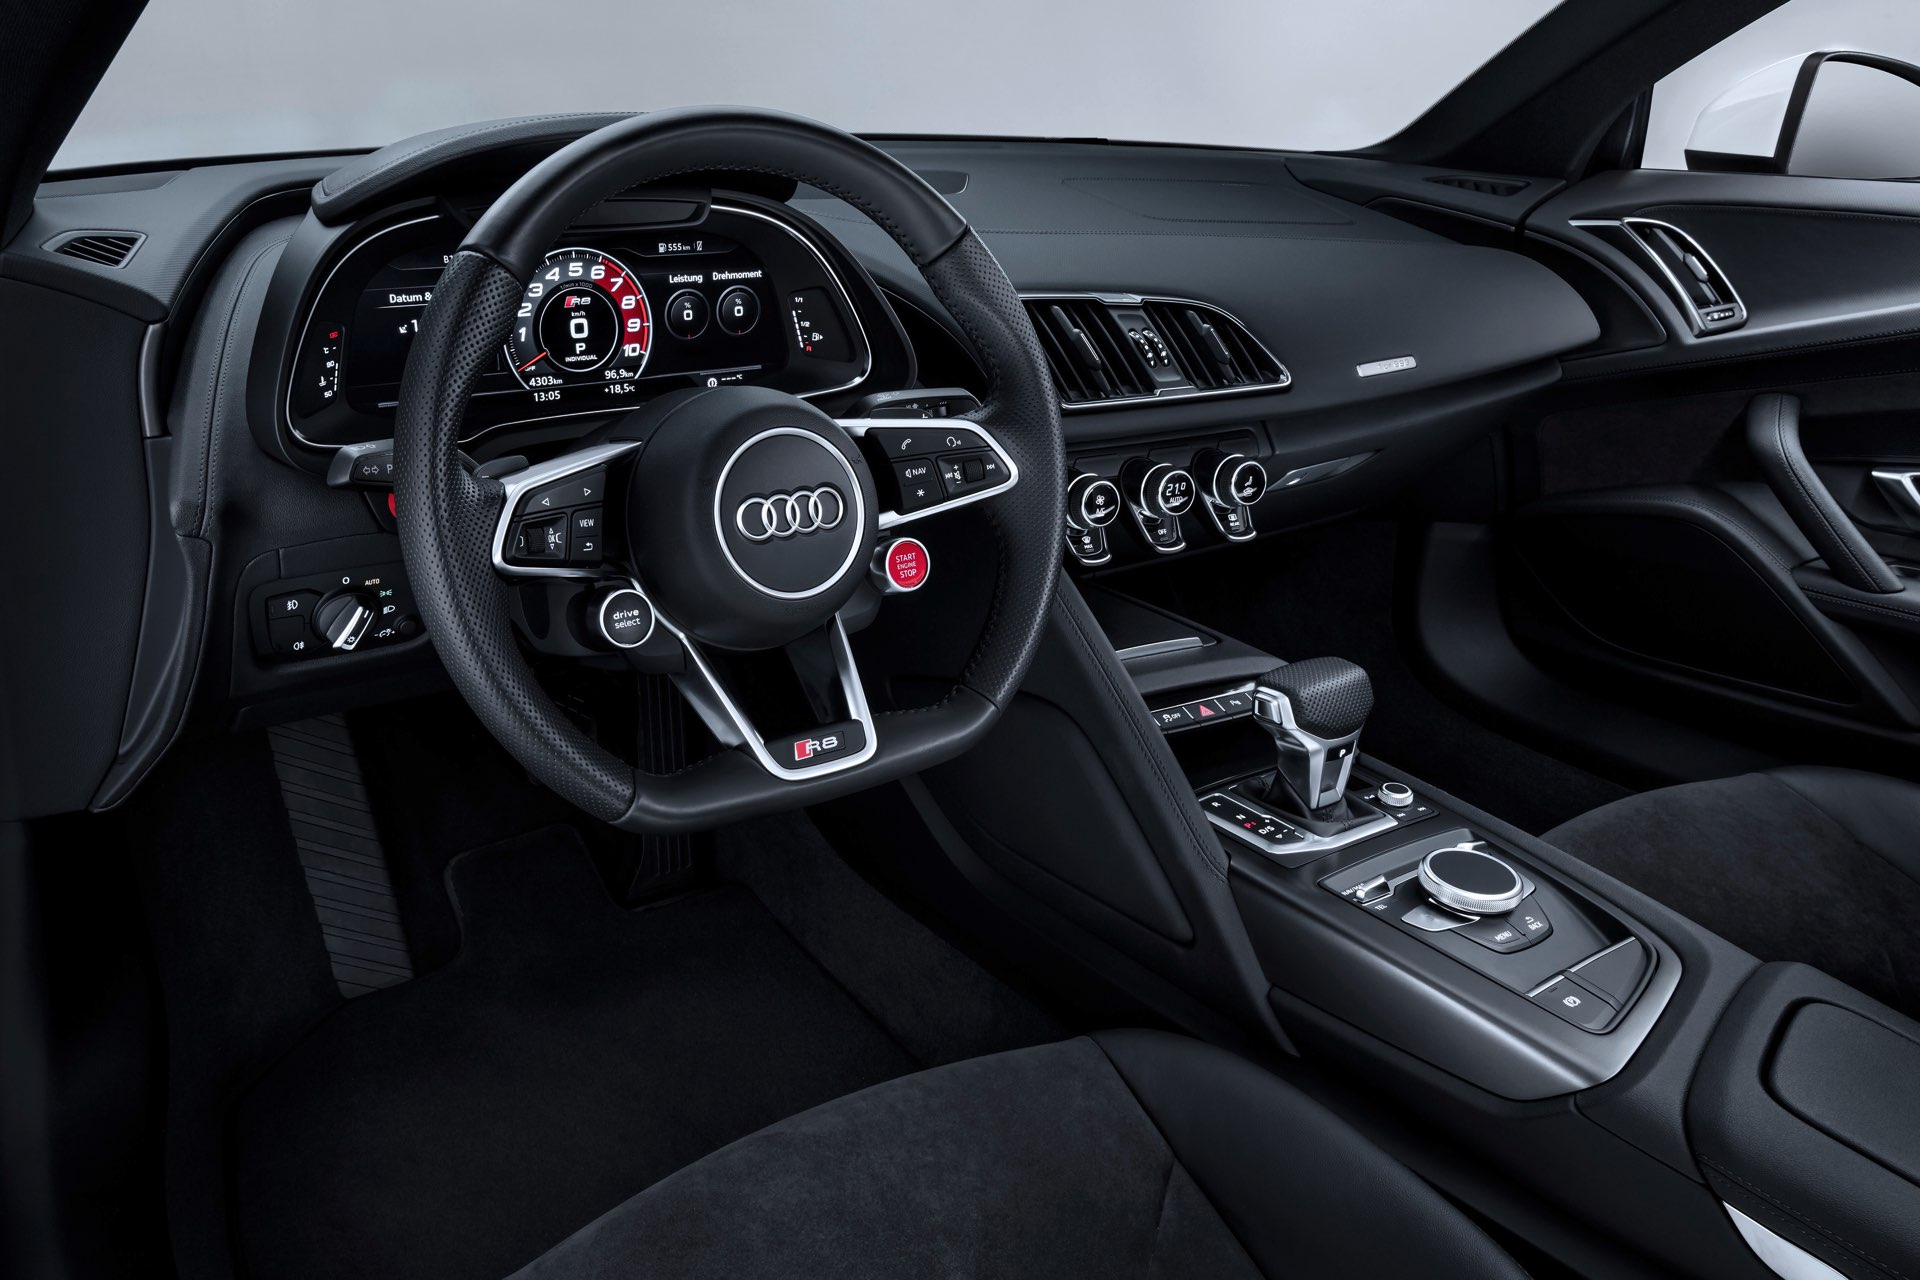 Official Audi R8 V10 RWS  Limited to 999  GTspirit